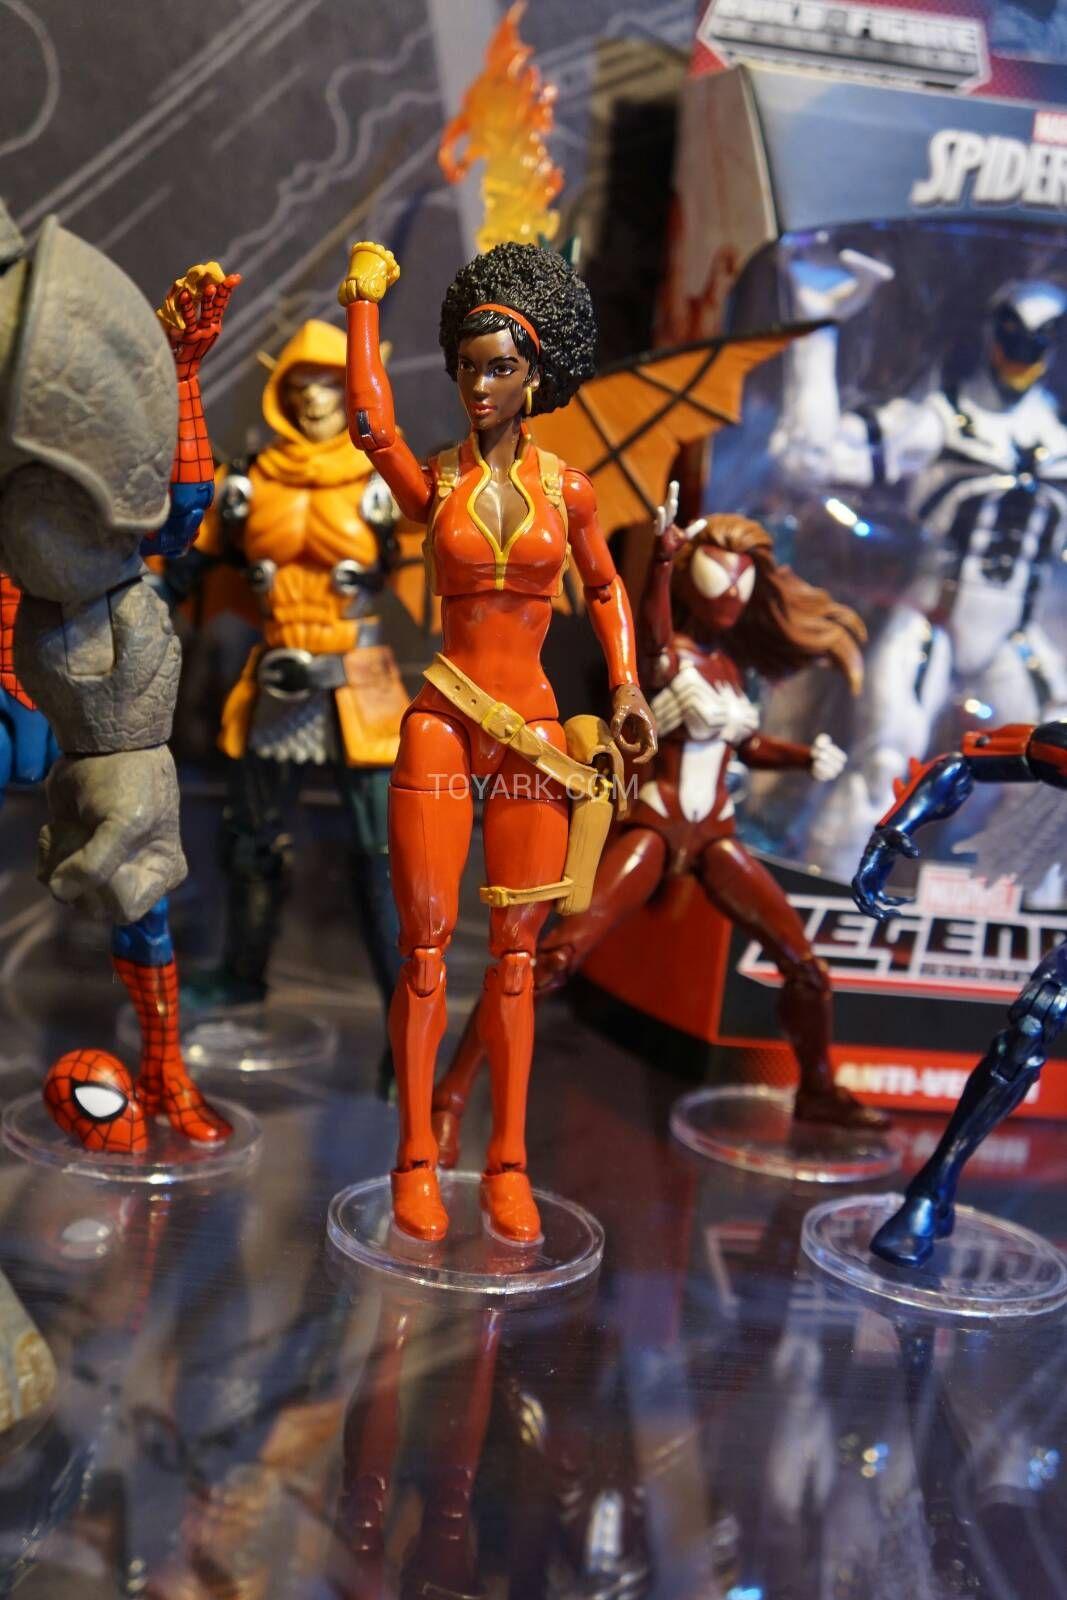 Toy Fair 2015 Hasbro Marvel Legends Misty Knight!!! Via ToyArk